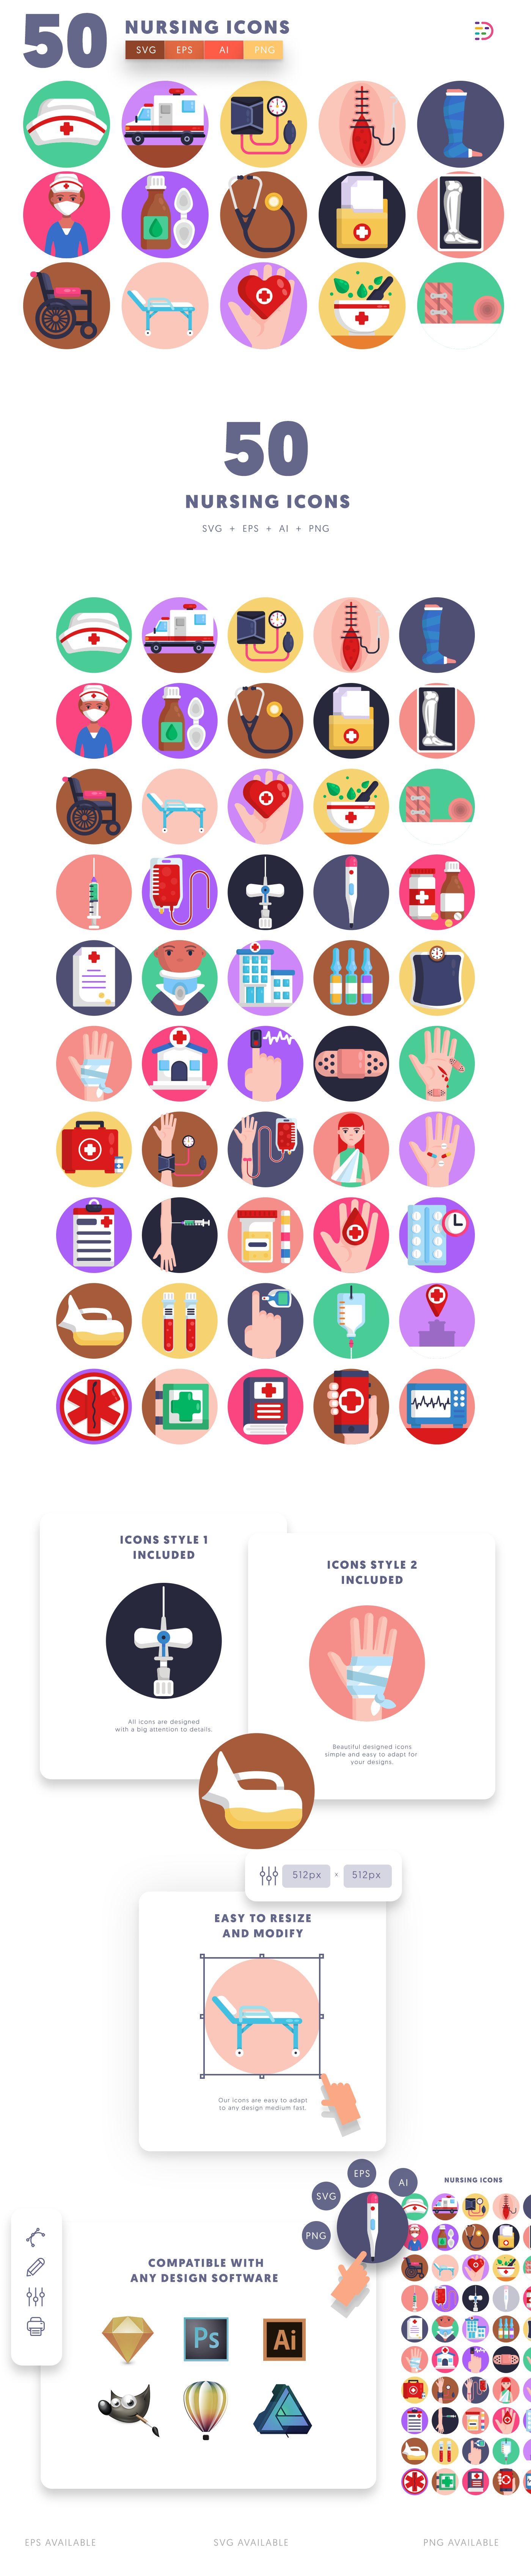 Nursing icons info graphic